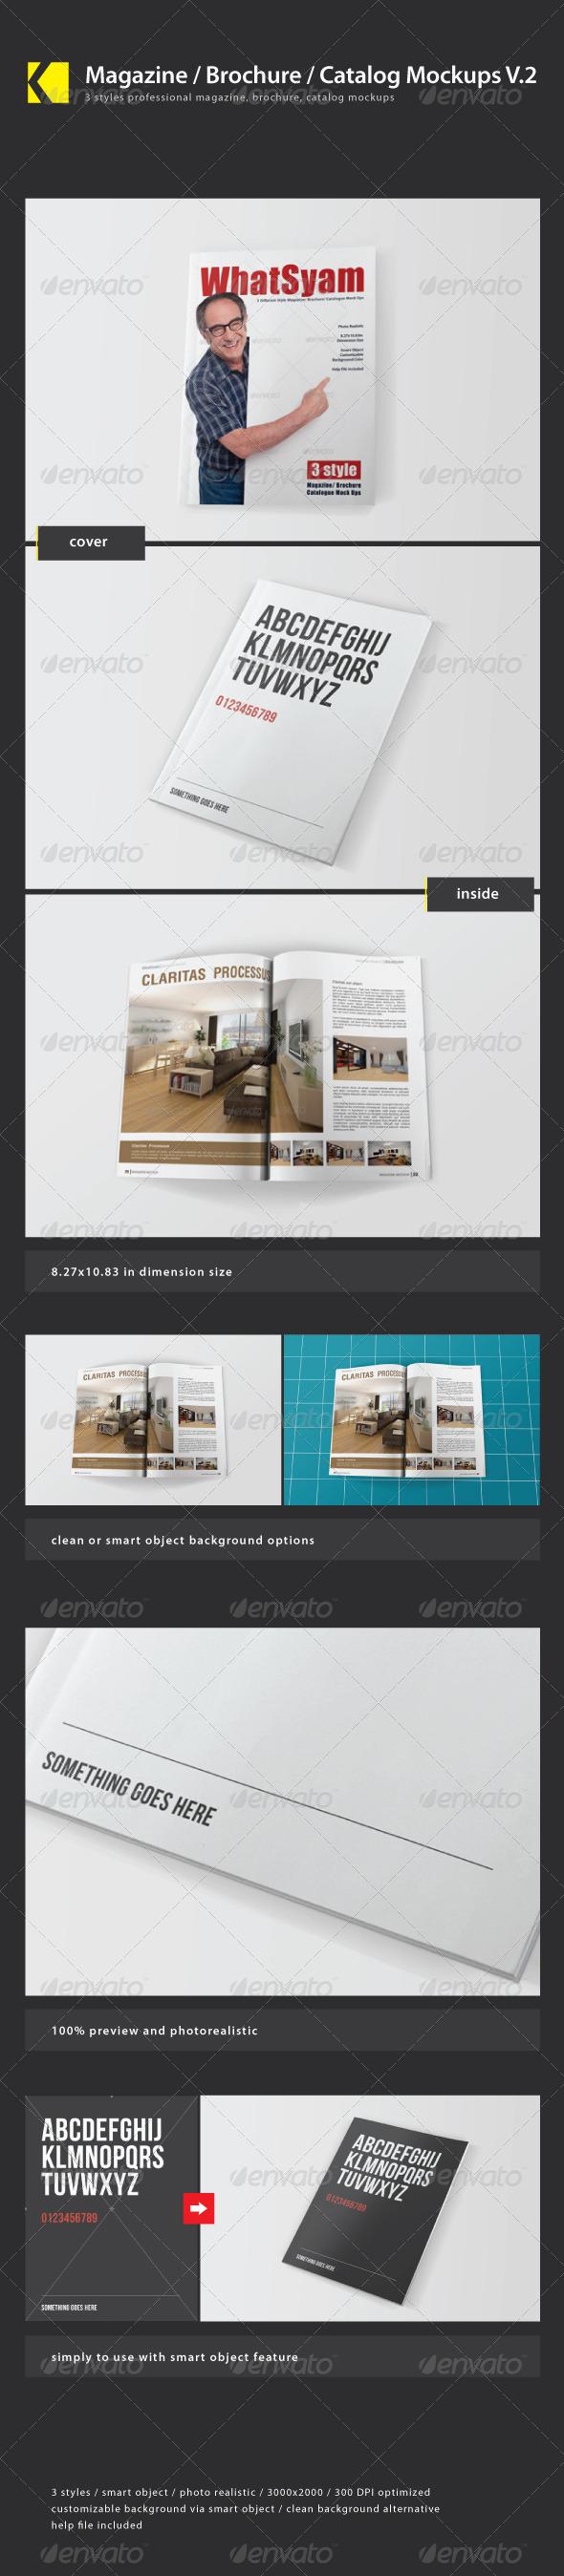 Magazine / Brochure / Catalog Mockups V.2 - Print Product Mock-Ups